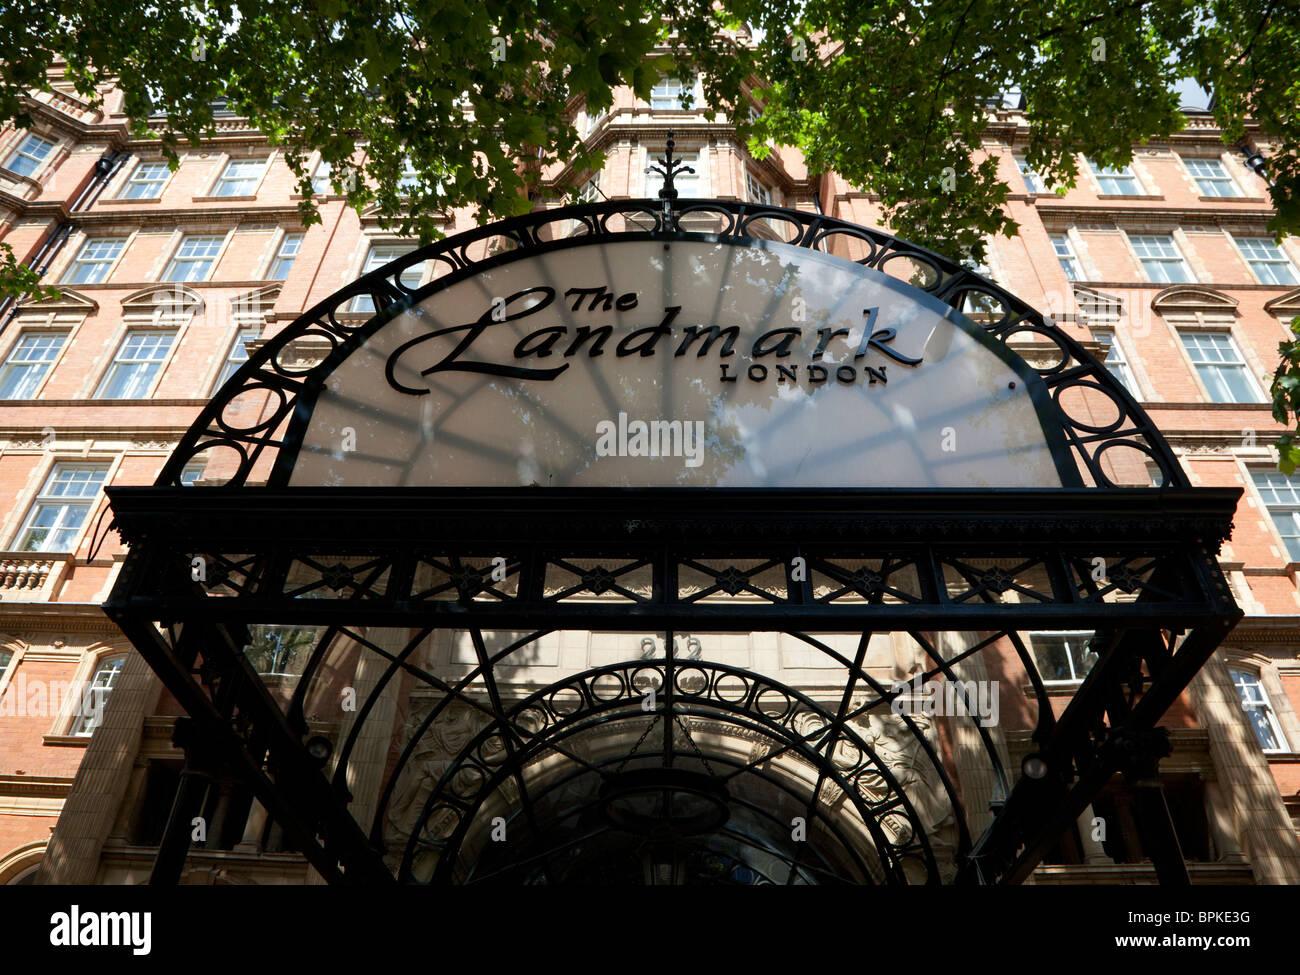 The Landmark Hotel, Marylebone Road, London Stock Photo